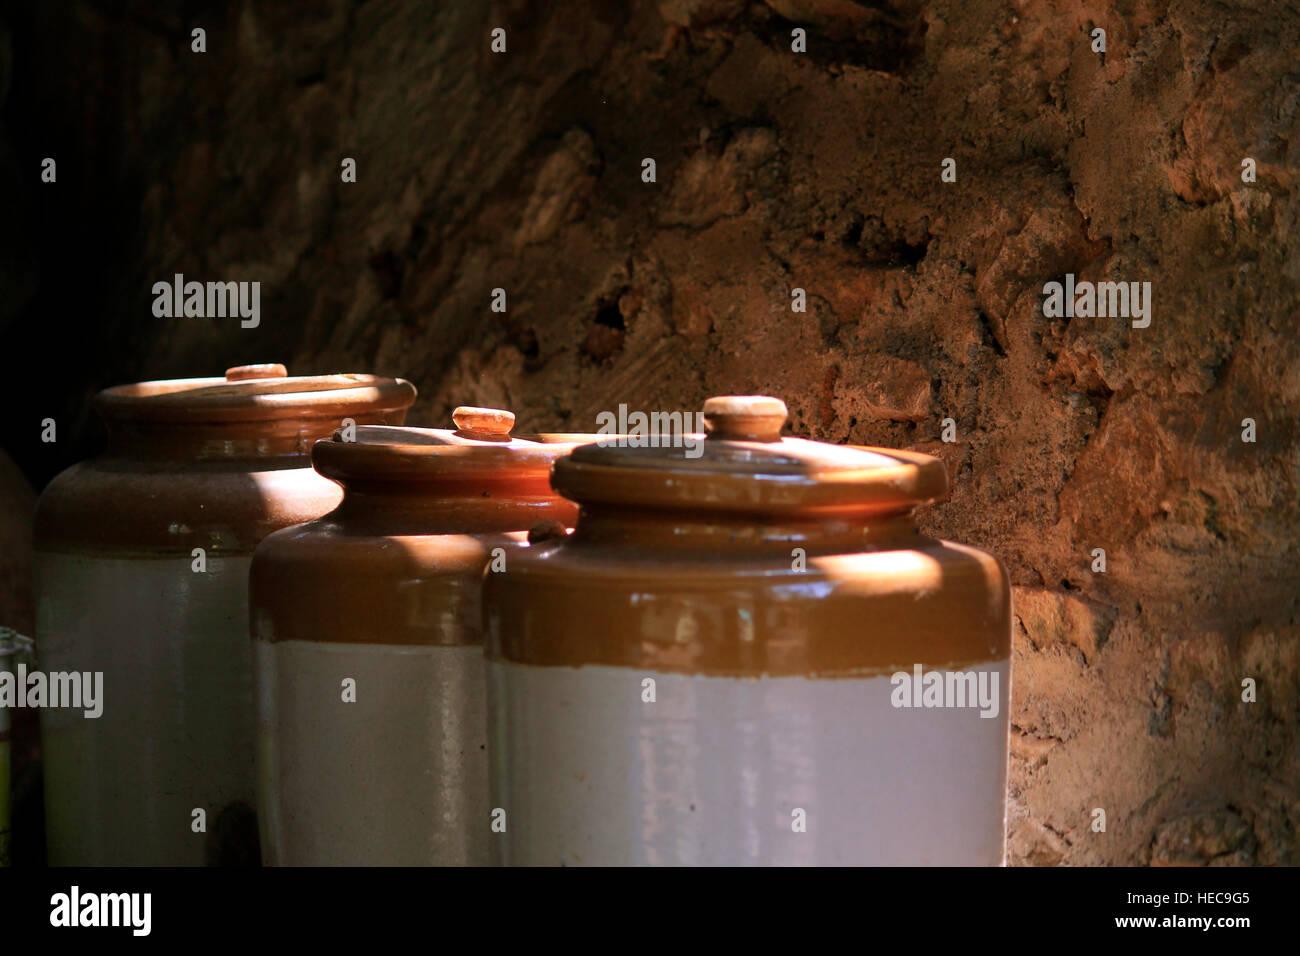 Wine bottles - Stock Image